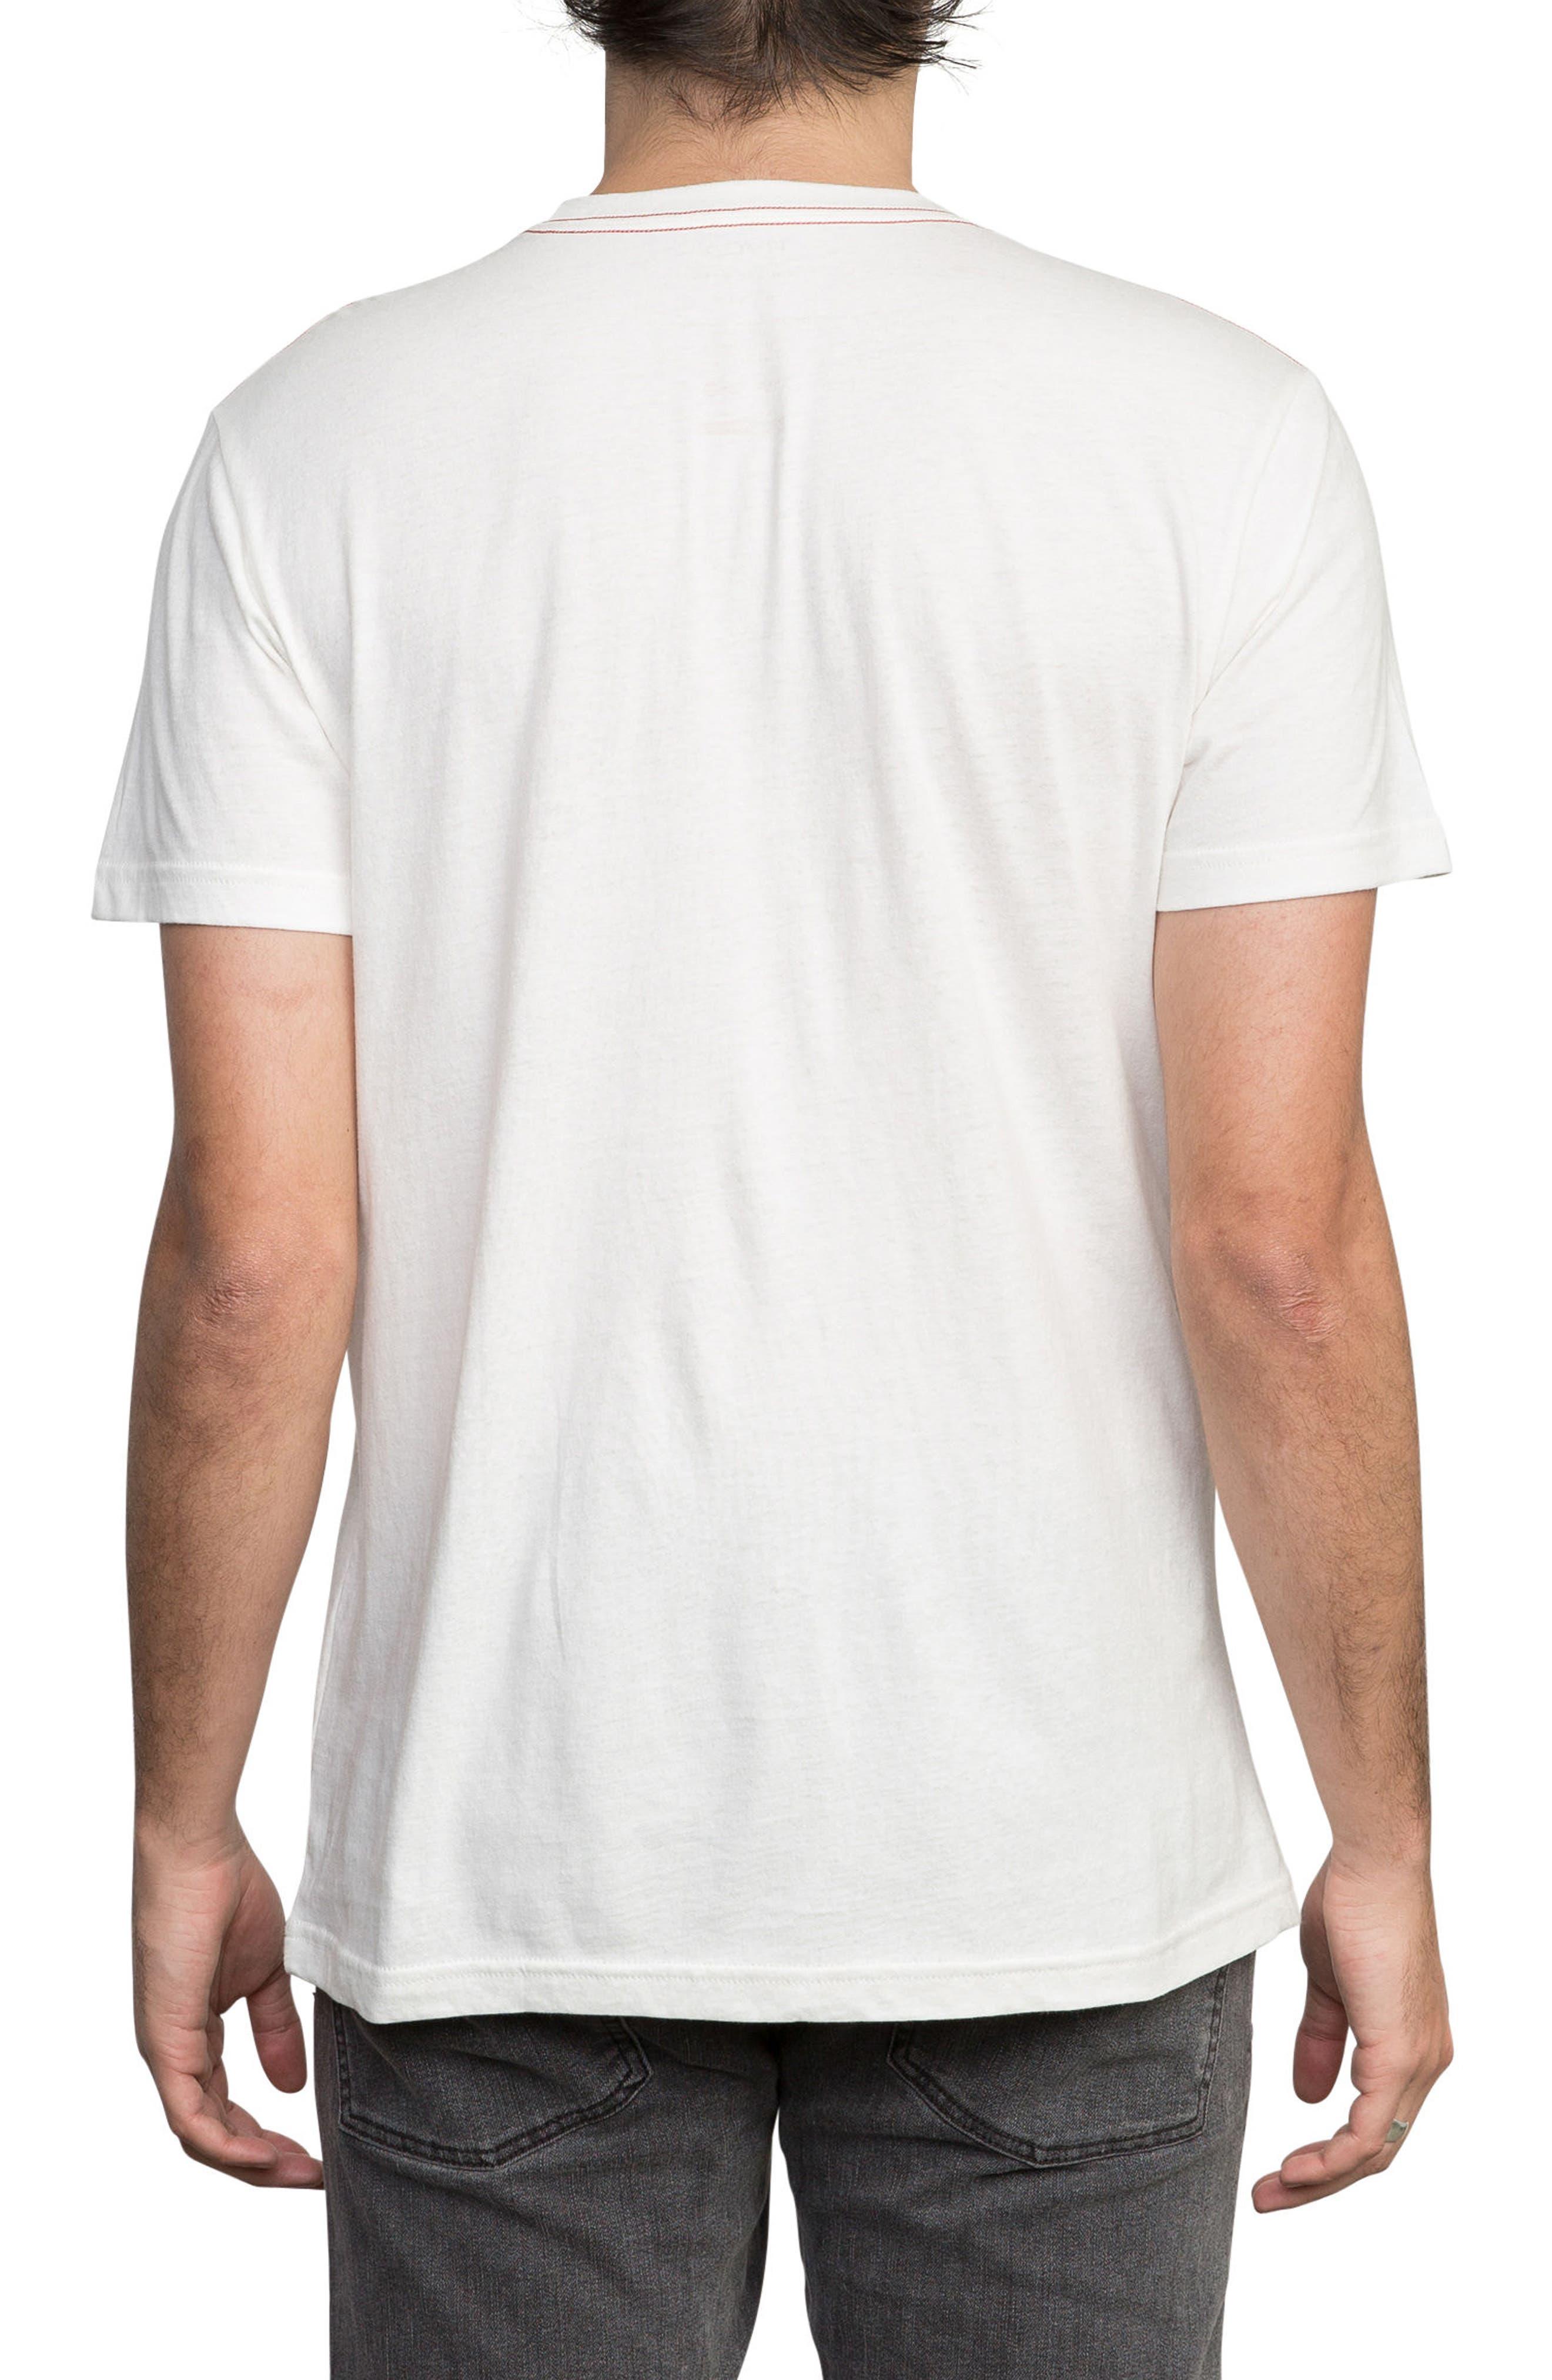 Oblow Roses T-Shirt,                             Alternate thumbnail 2, color,                             ANTIQUE WHITE